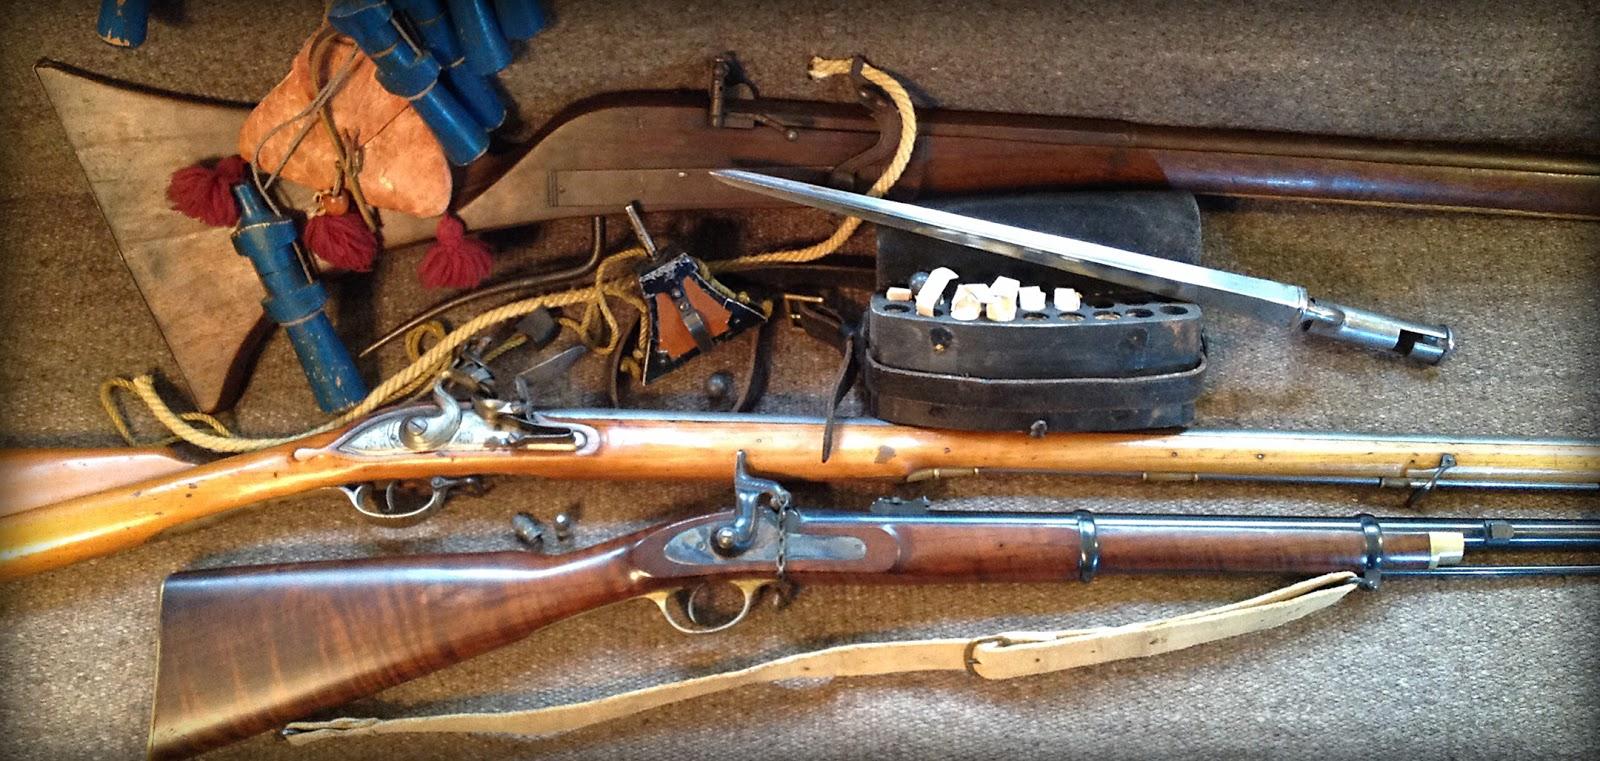 Gordonu0027s Gun Closet #5: The Musket